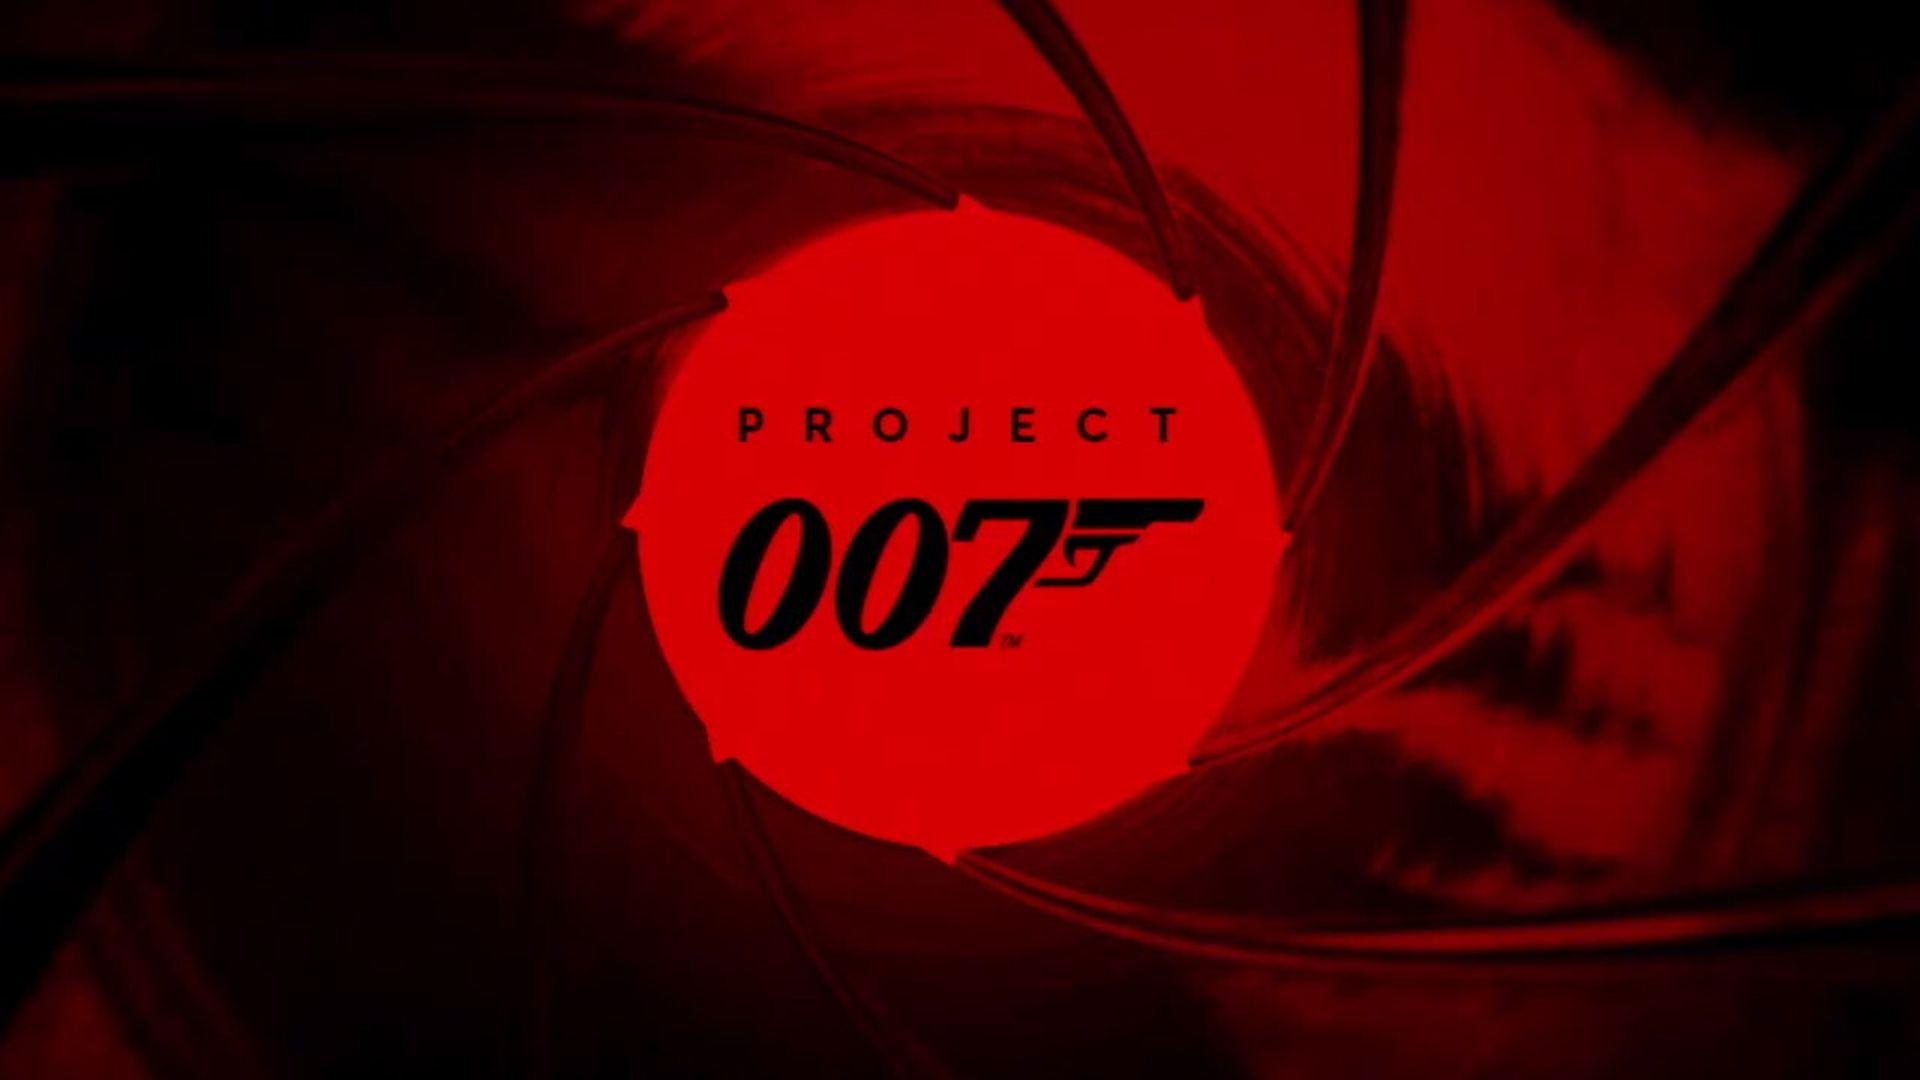 Projecto 007 James Bond Logo